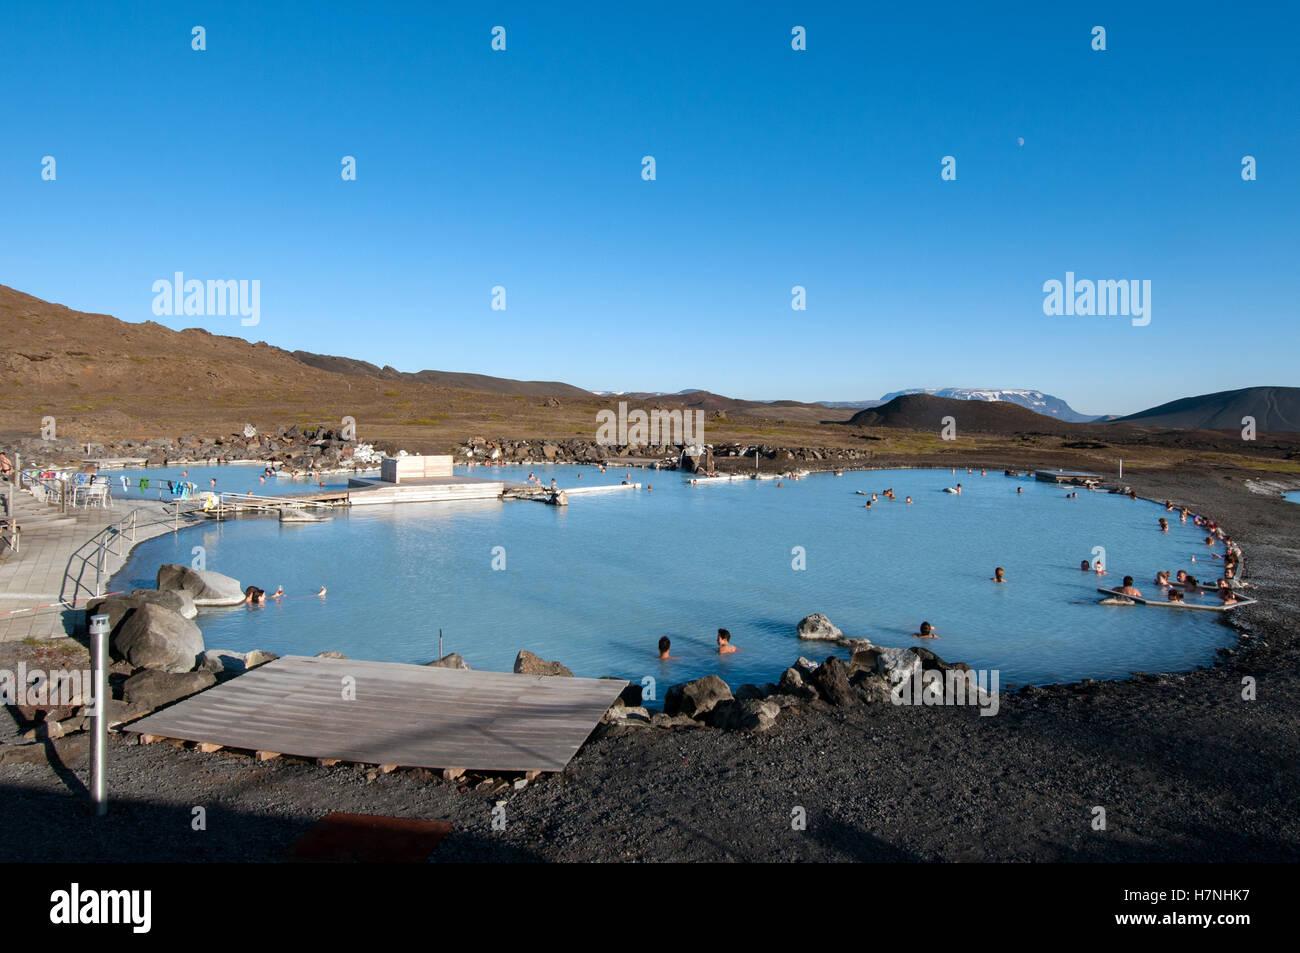 Myvatn Nature Baths, (Geothermal Hot Springs) Myvatn - Stock Image